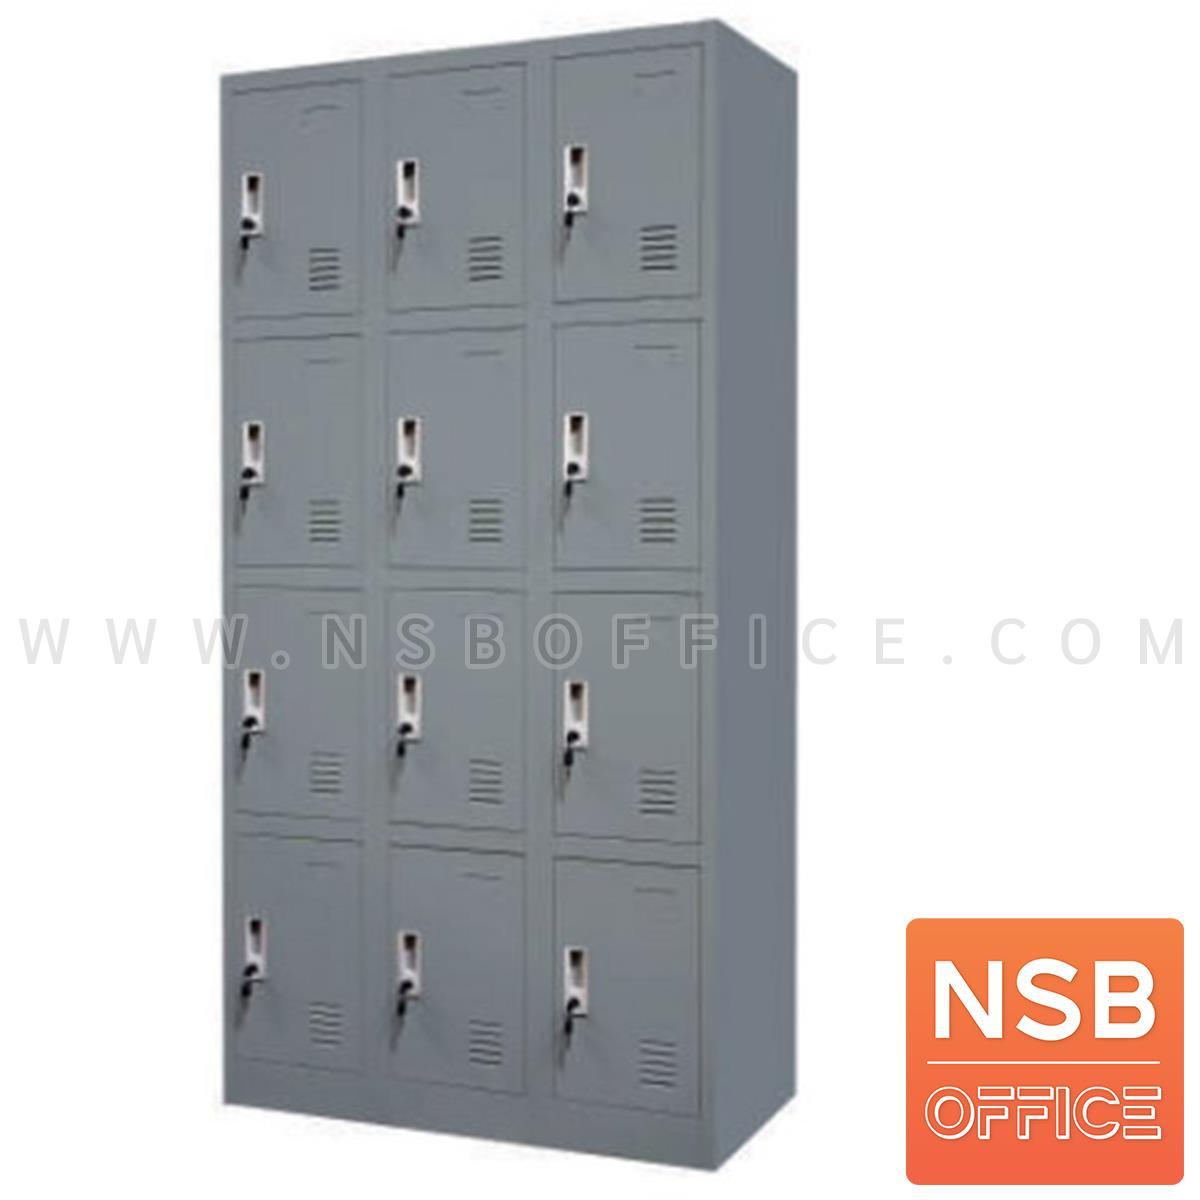 E03A059:ตู้ล็อกเกอร์ 12 ประตู รุ่น Sideswipe (ไซด์สวิป) ขนาด 91.7W*45.7D*185H ซม